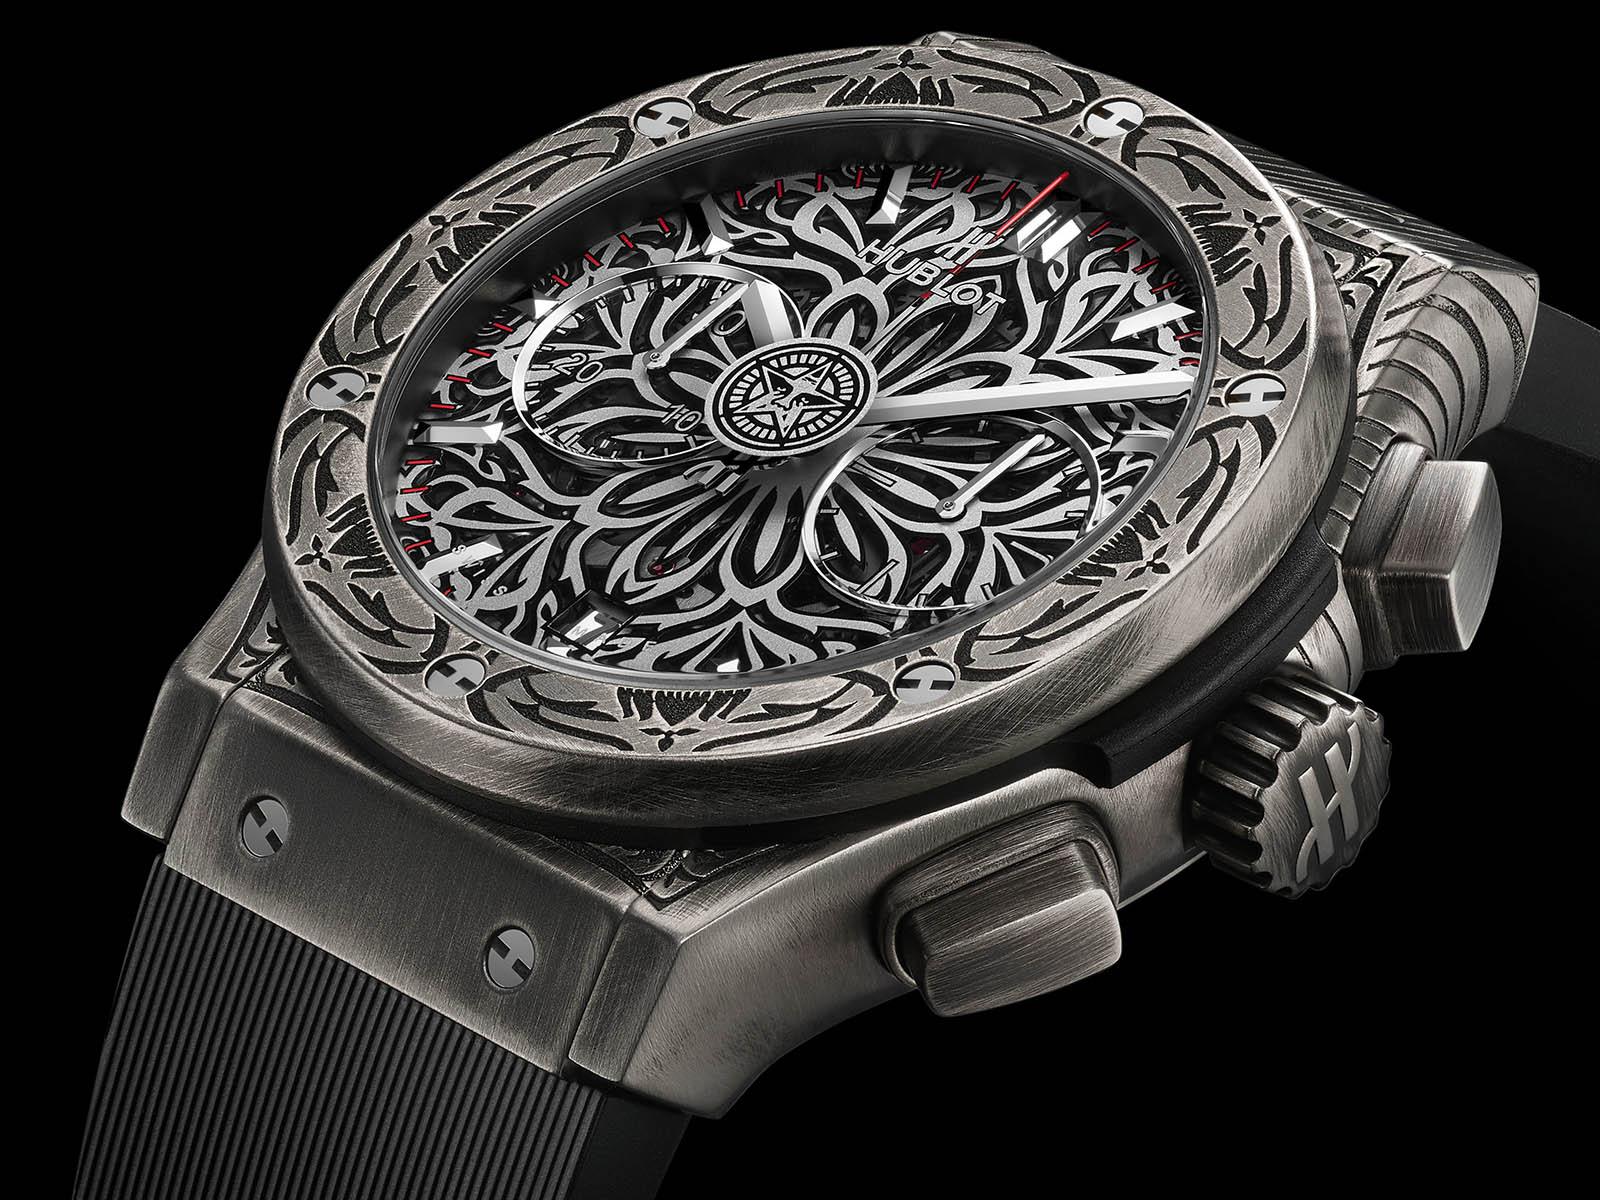 525-nx-0137-rx-shf21-hublot-classic-fusion-chronograph-shepard-fairey-7.jpg